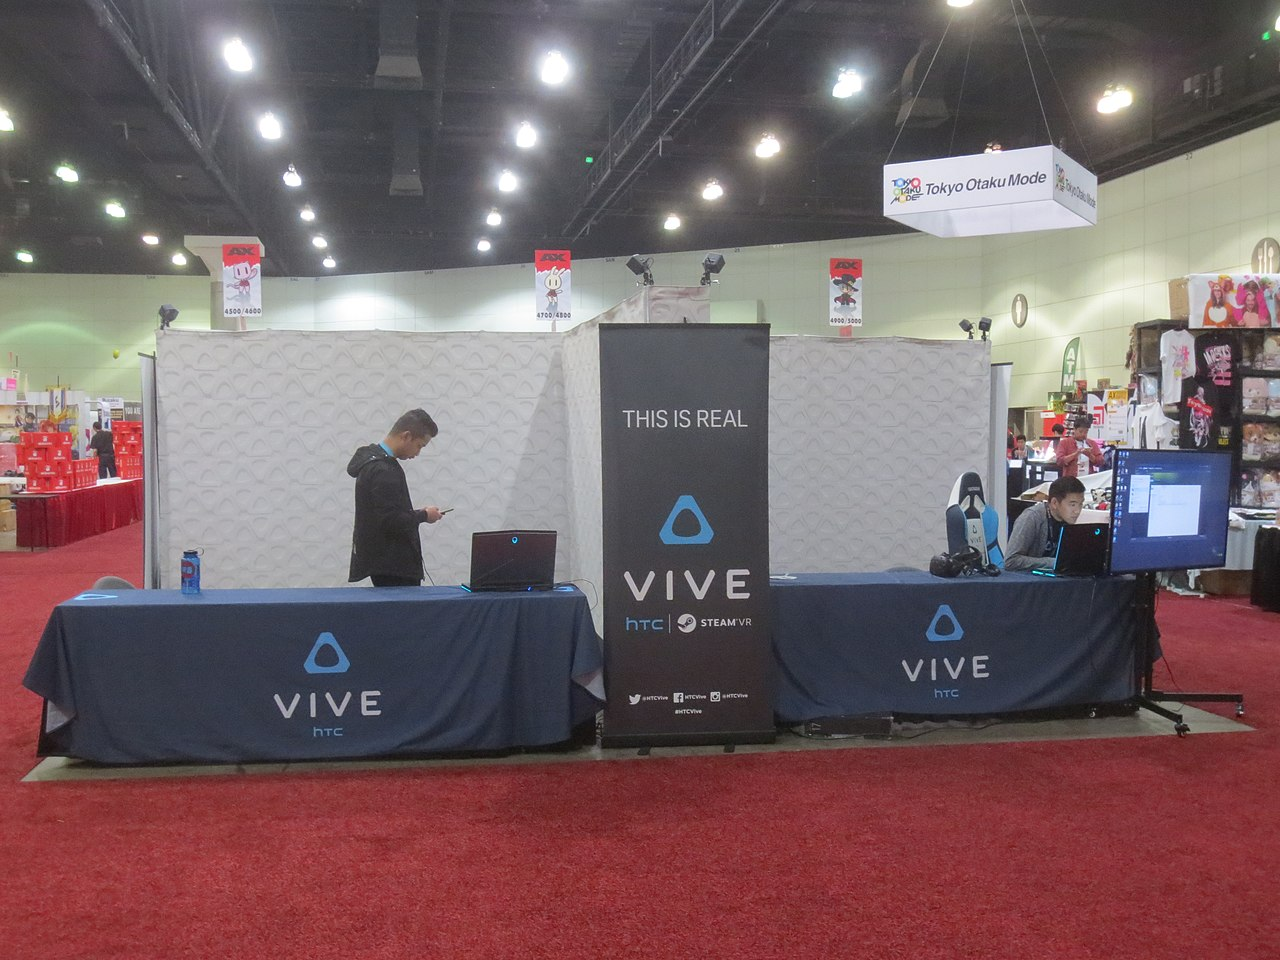 FileHTC Vive Booth Anime Expo 20170703